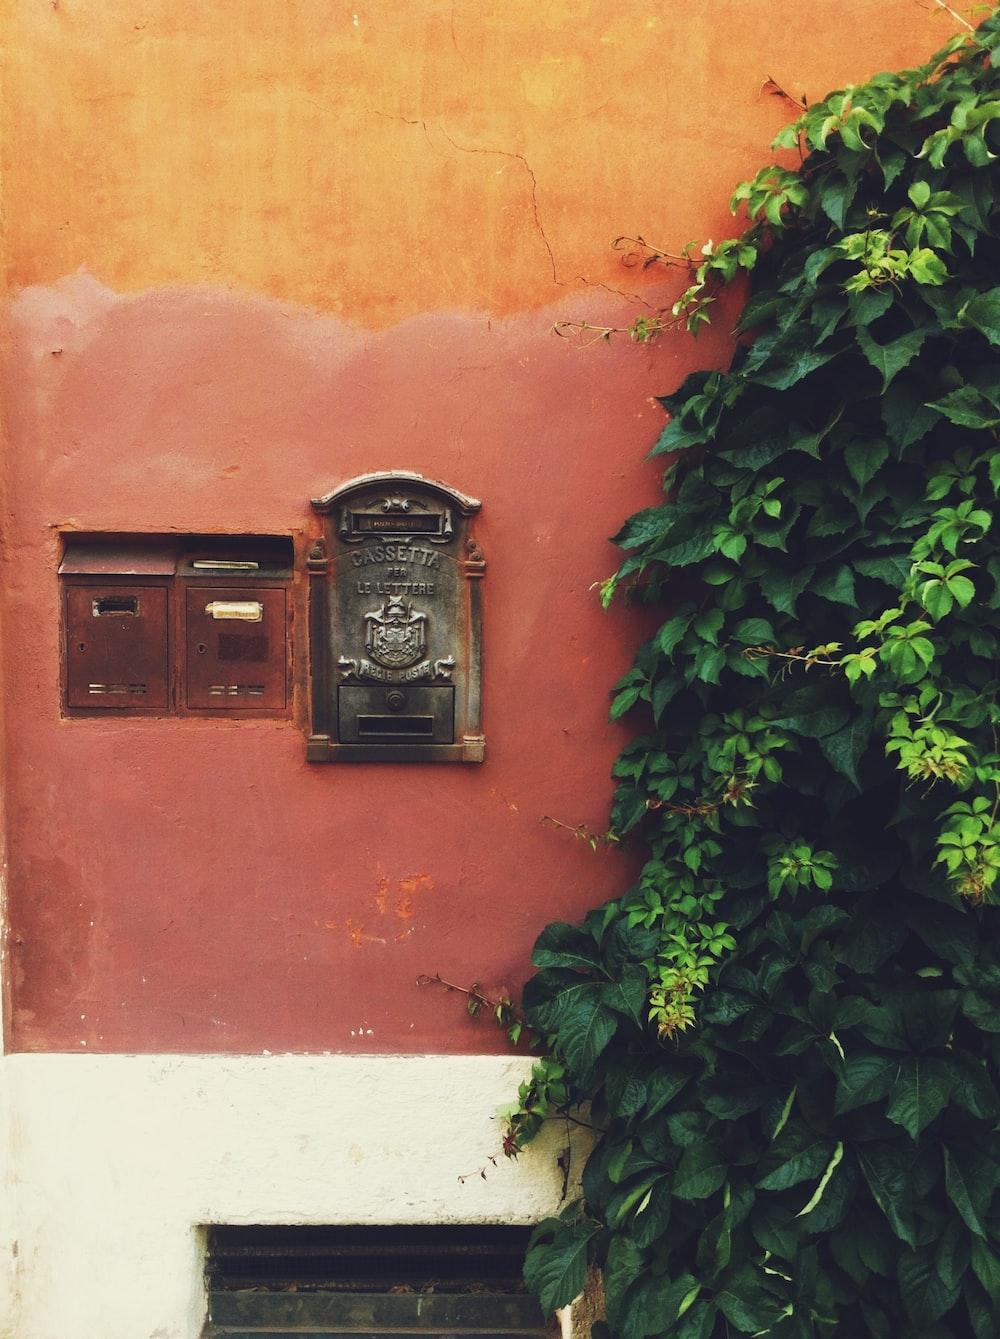 black mailbox on wall